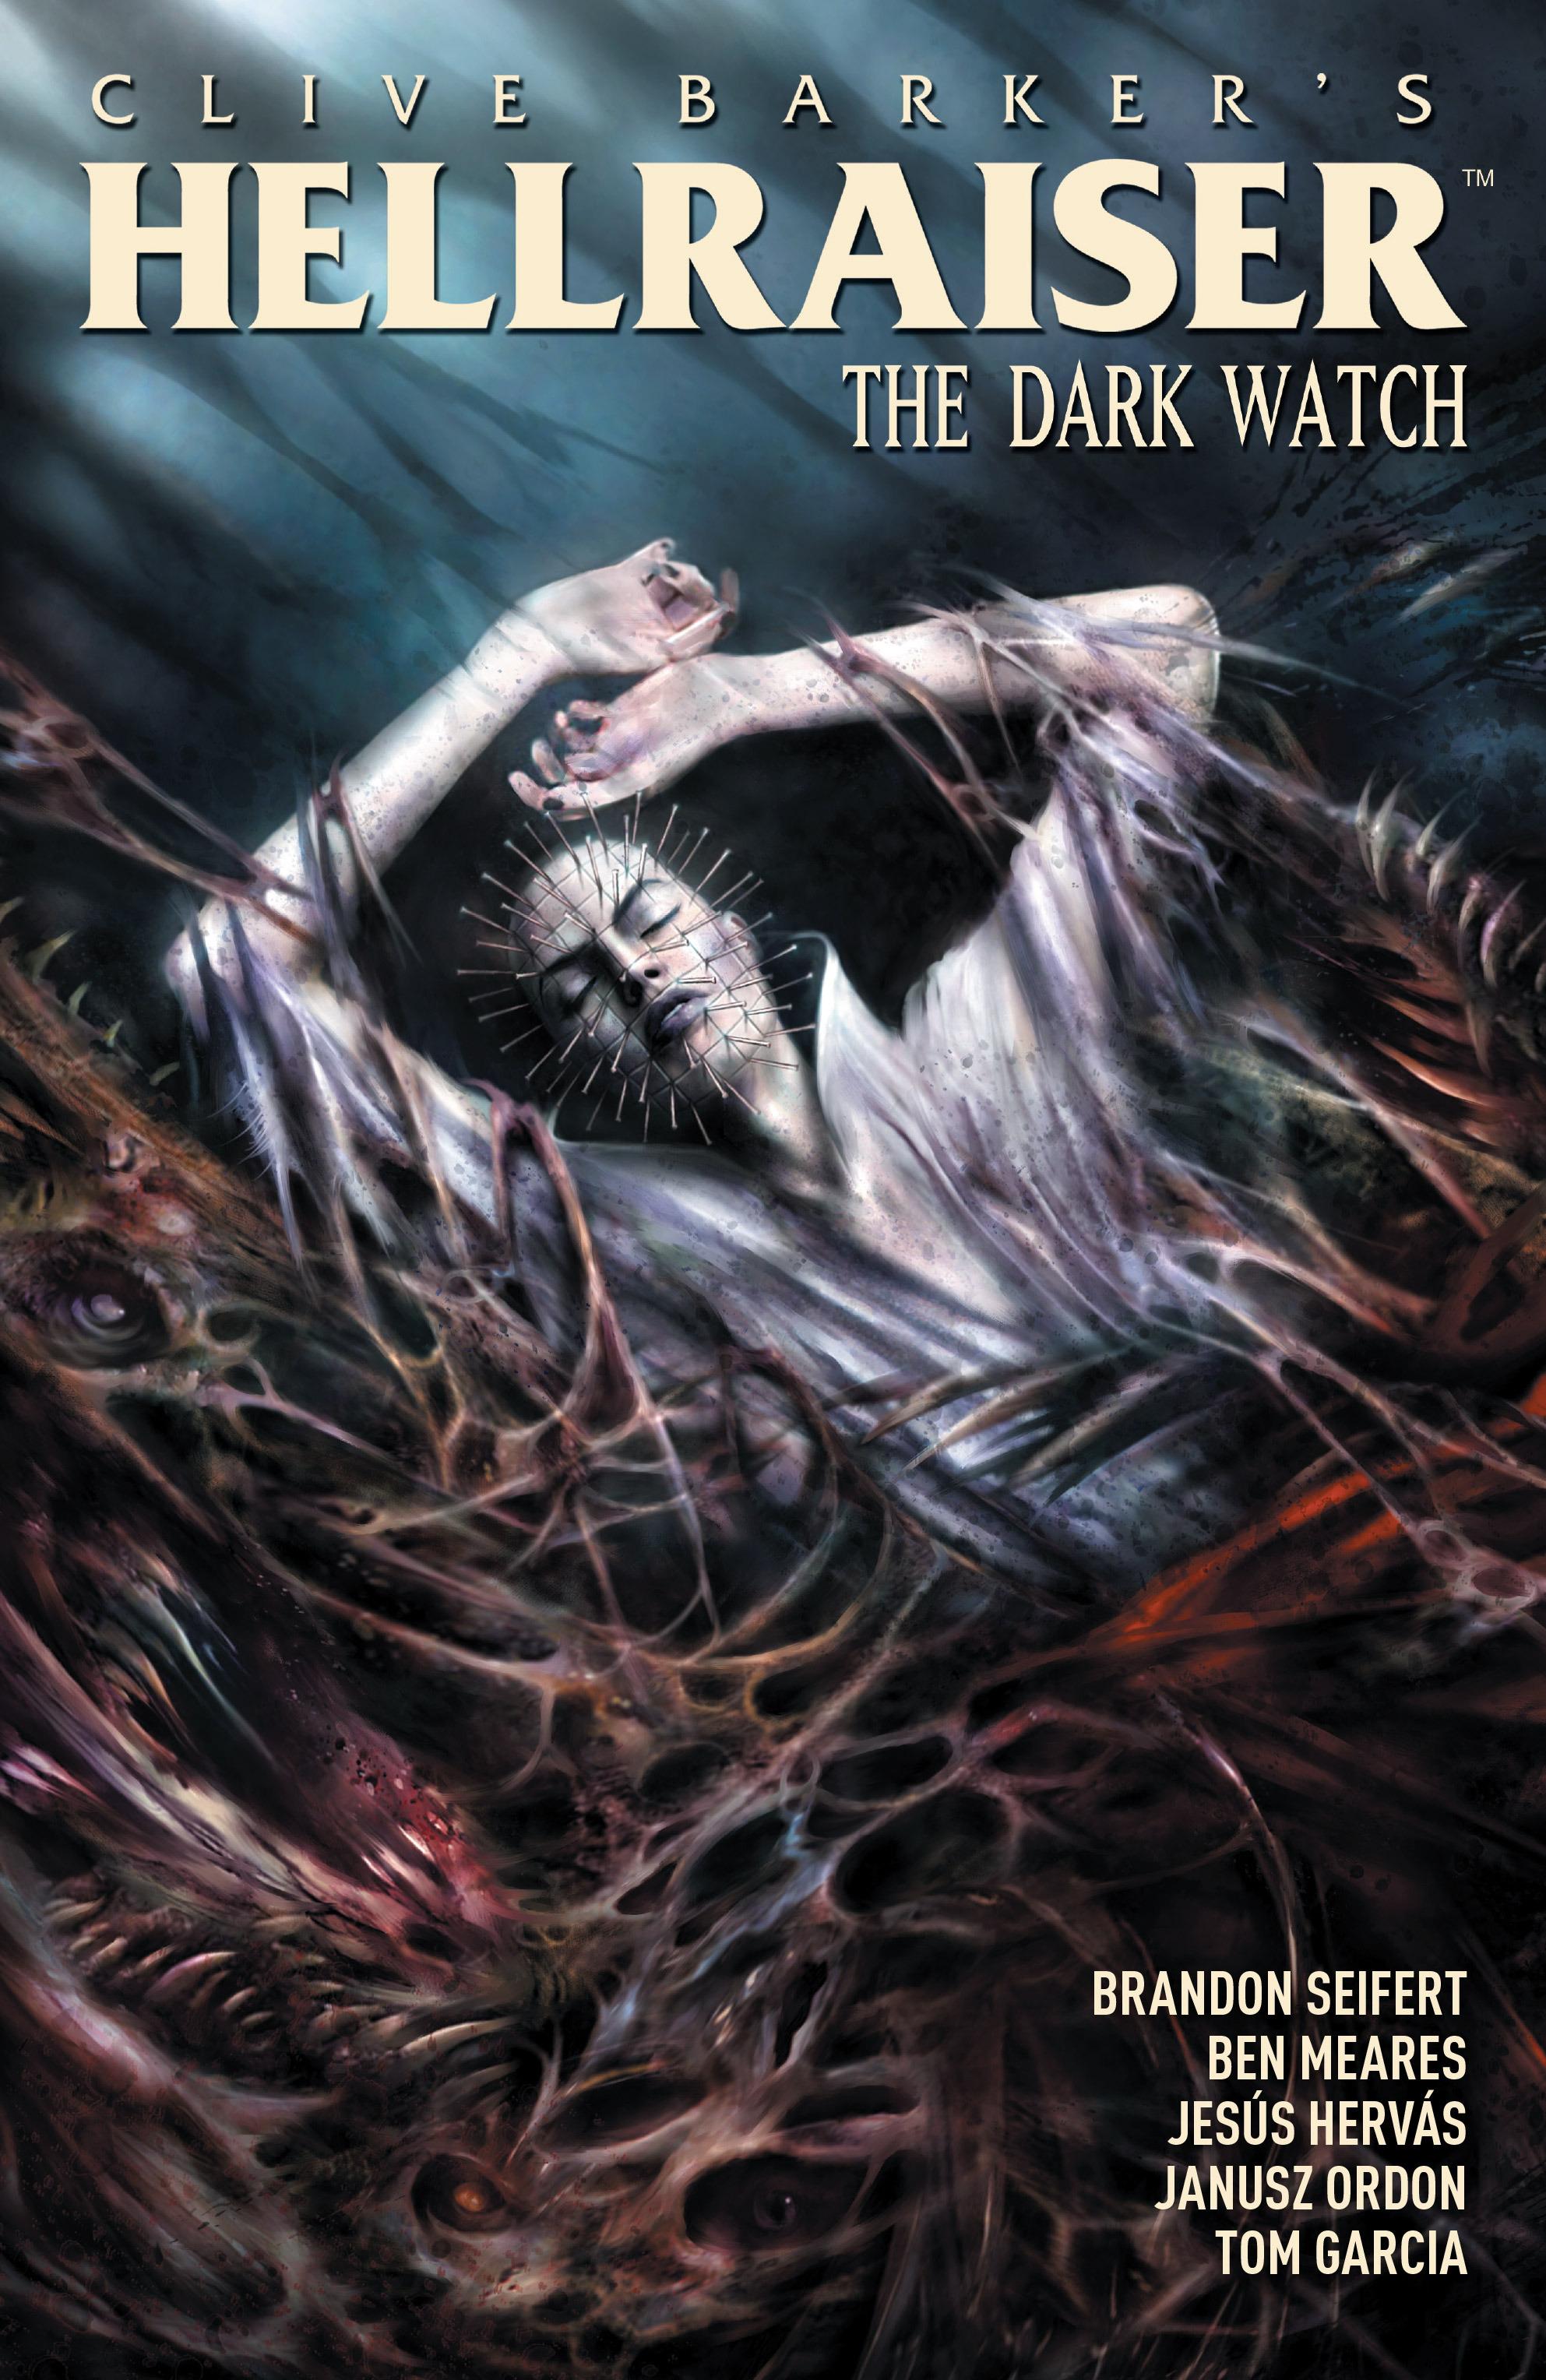 Read online Clive Barker's Hellraiser: The Dark Watch comic -  Issue # TPB 3 - 1